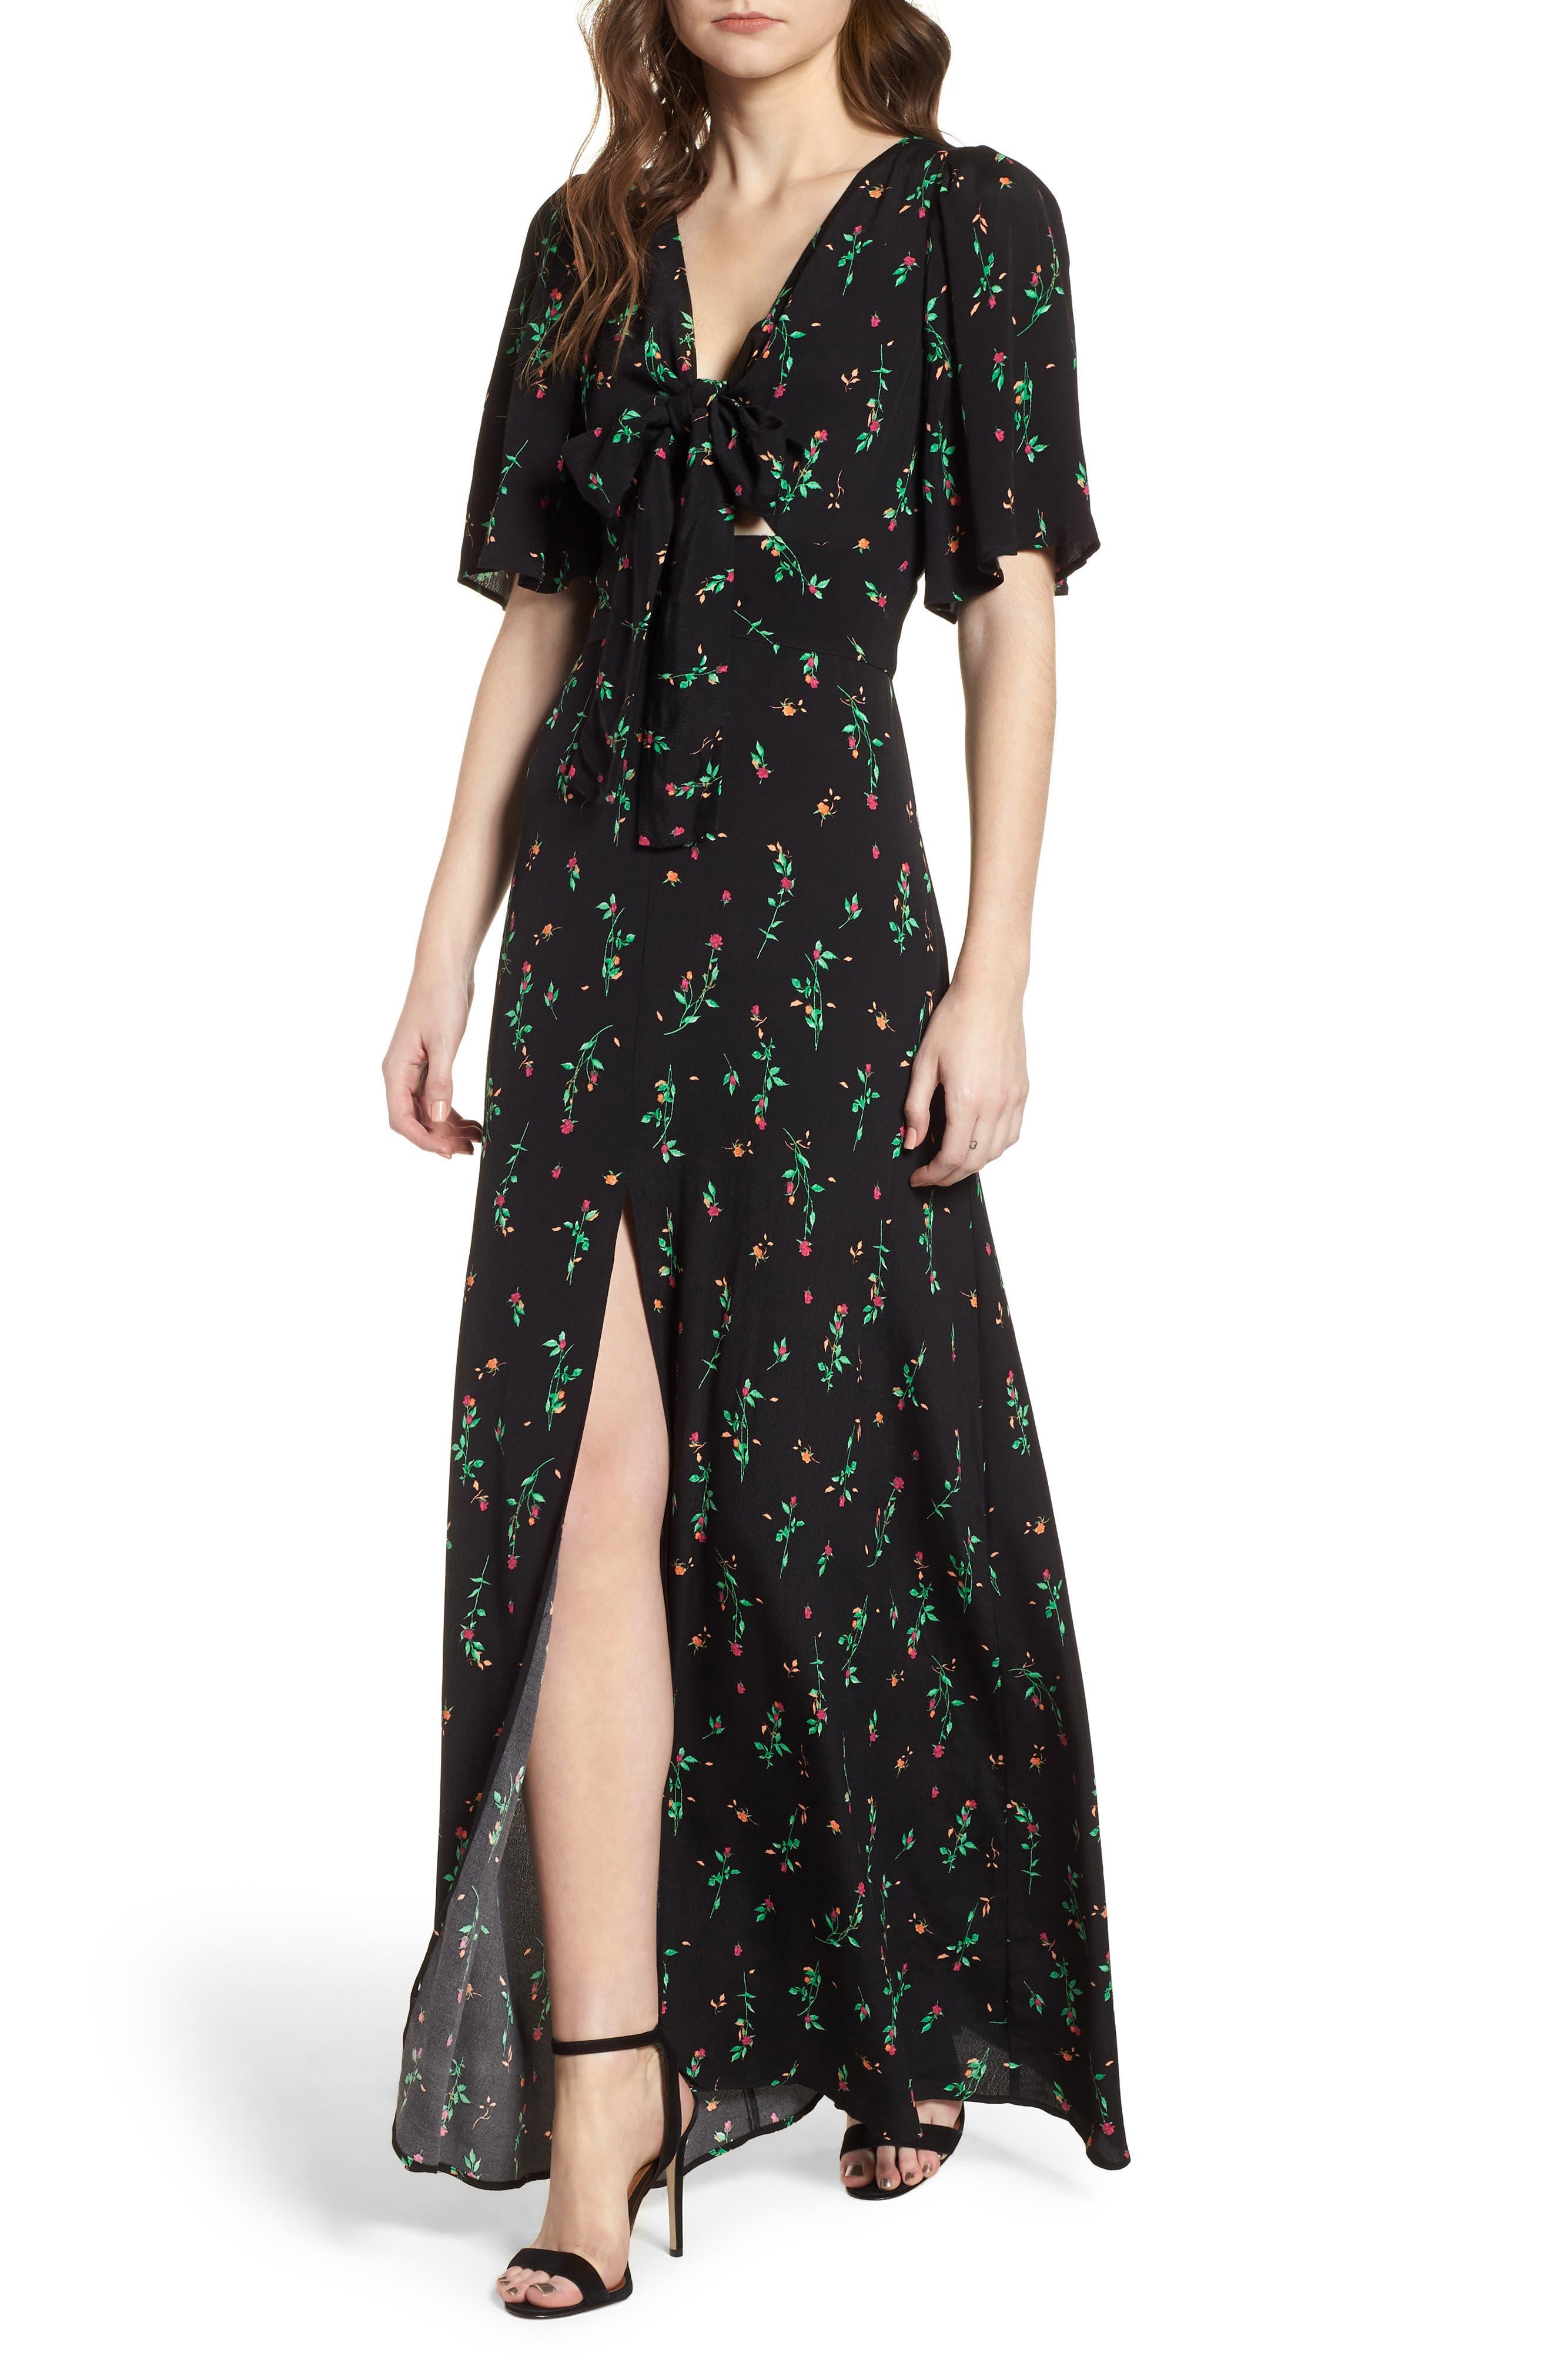 Ramon Tie Front Maxi Dress,                         Main,                         color, Noir Rose Ditsy